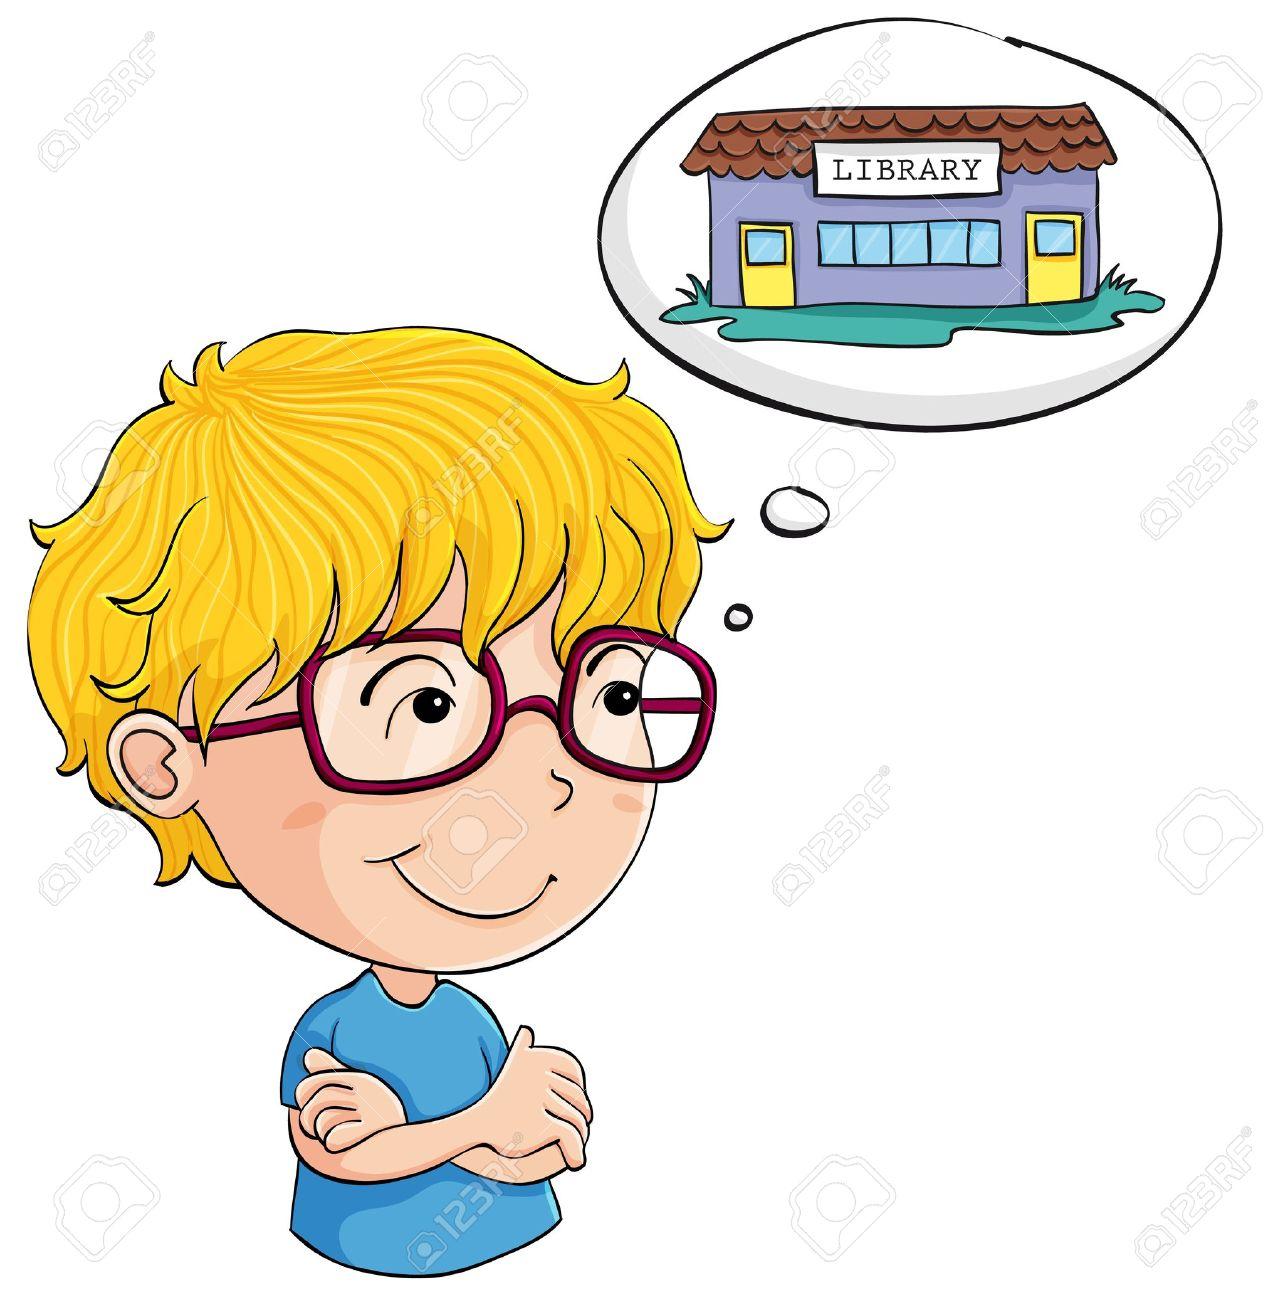 Child Thinking Clipart #14271-Child Thinking Clipart #14271-13